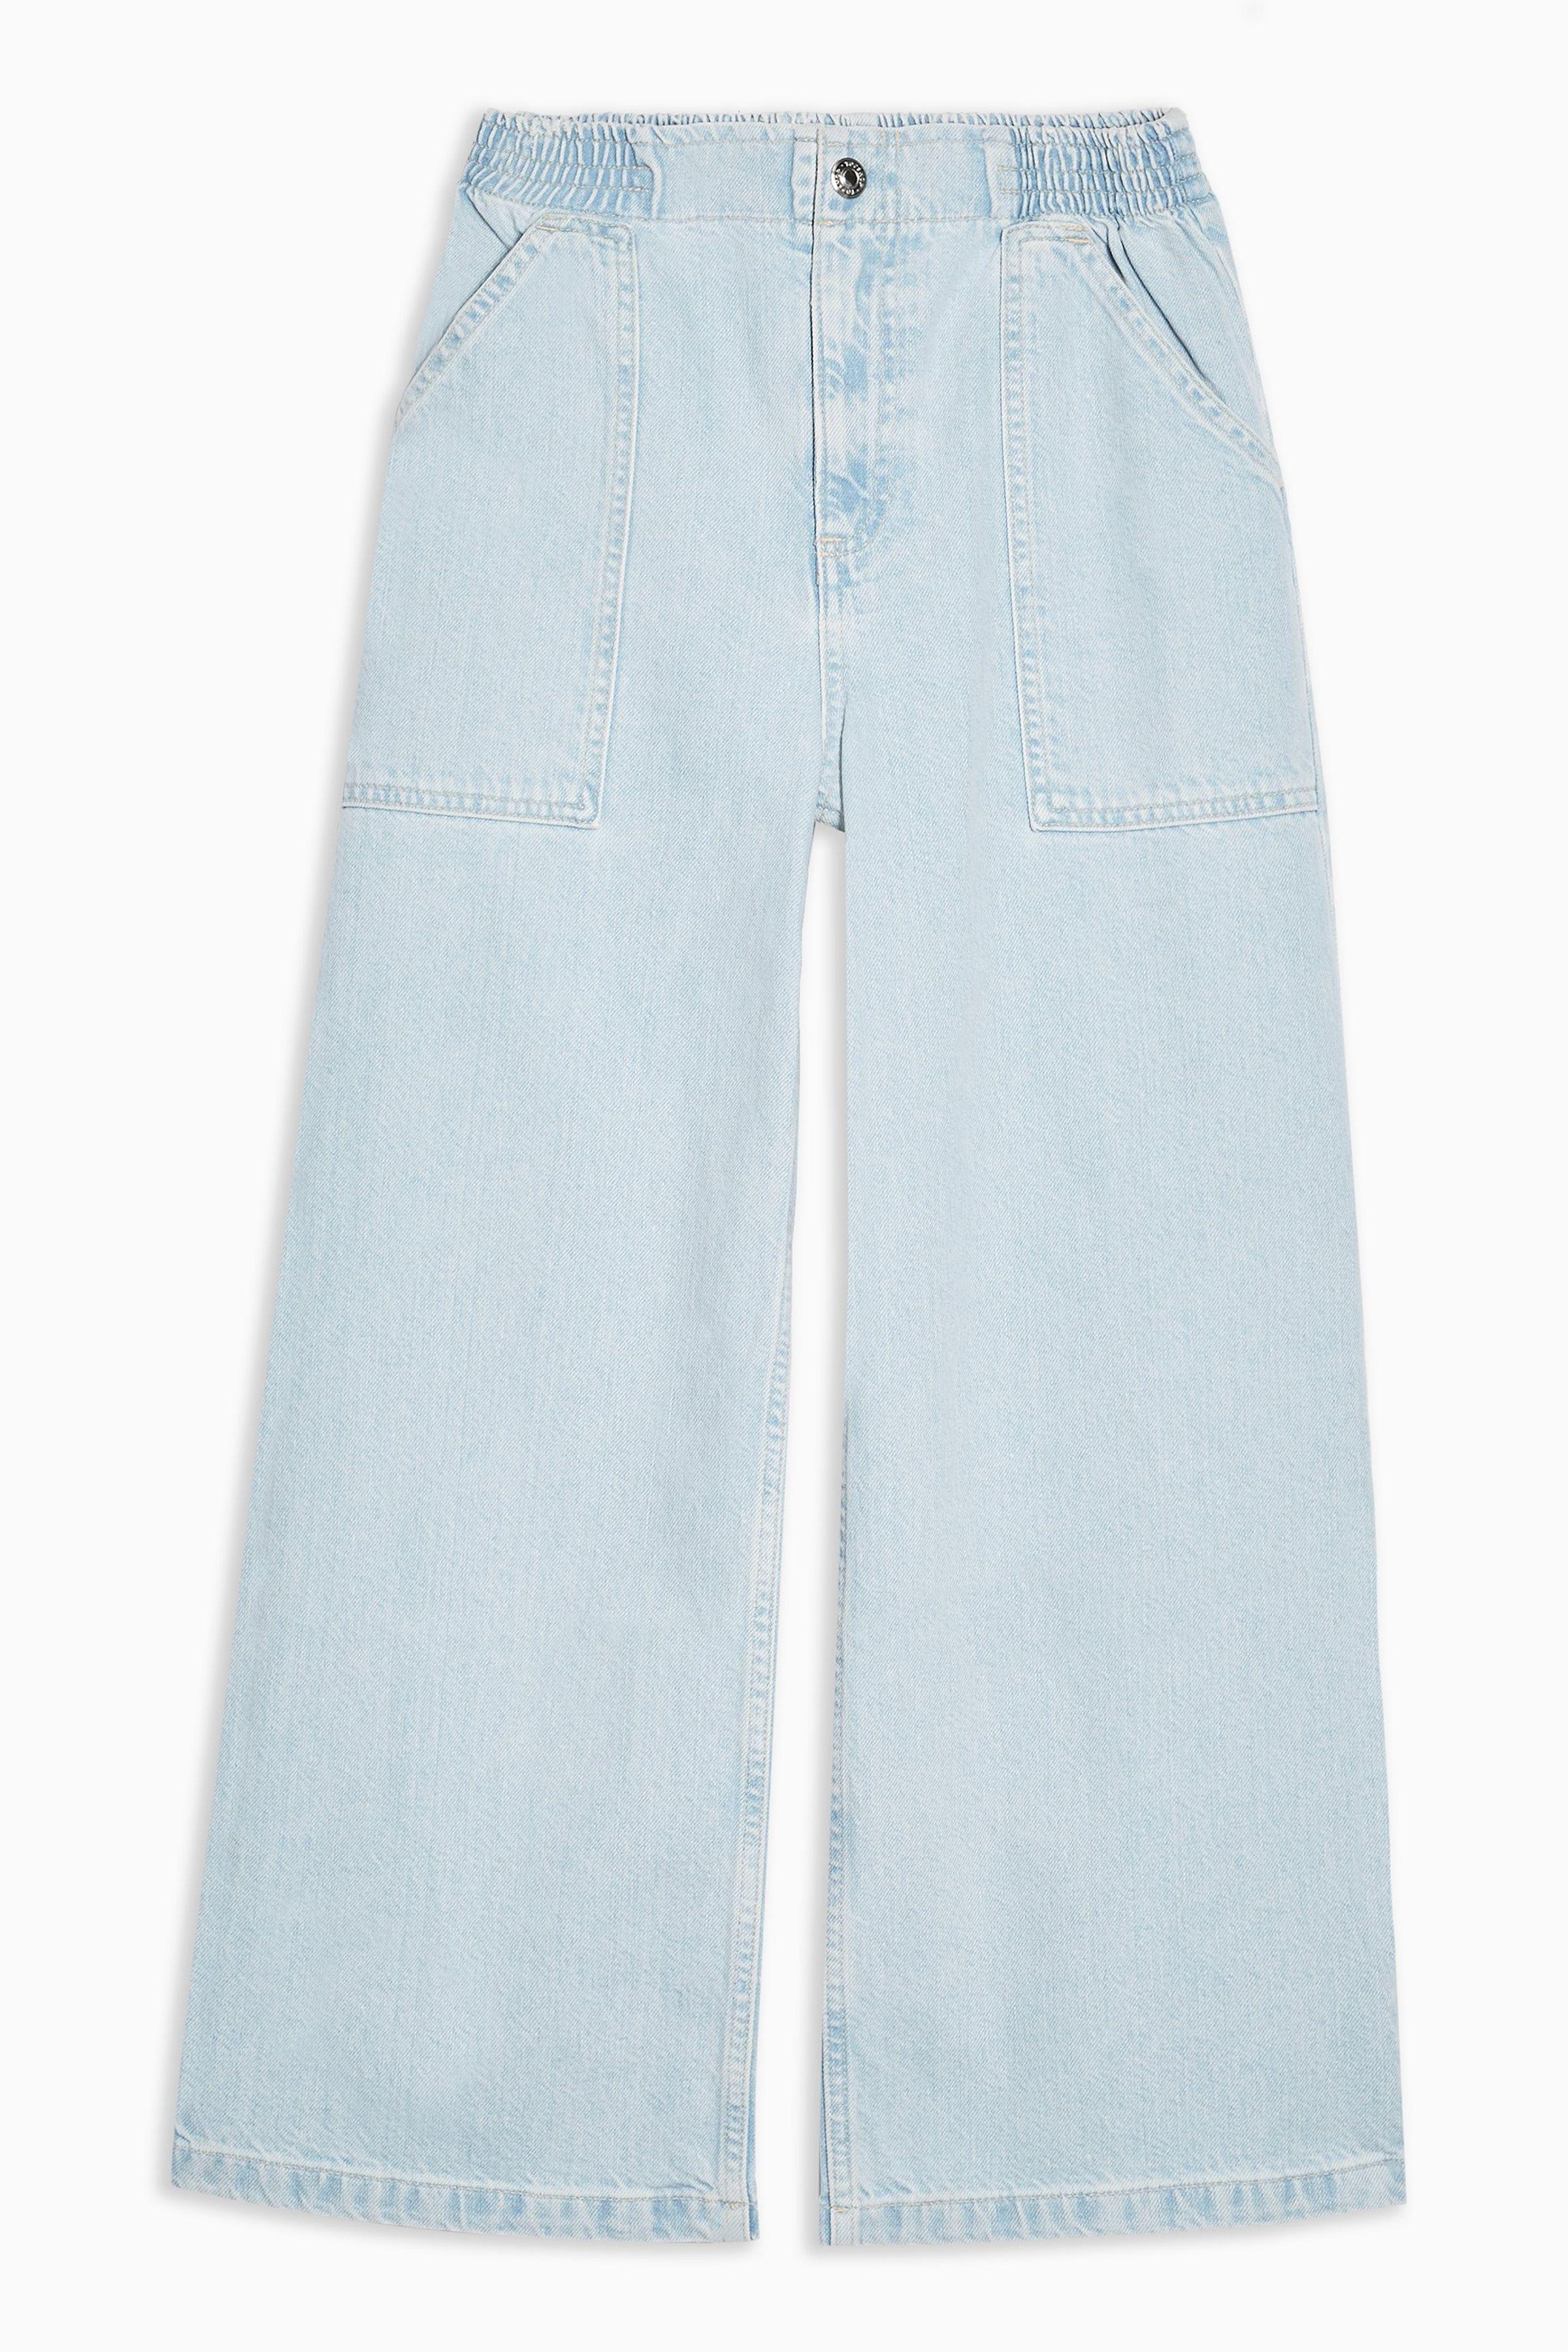 683808bcc6ef Bleach Wash Elastic Waist Crop Jeans   outfits   Denim skirt, Jeans ...